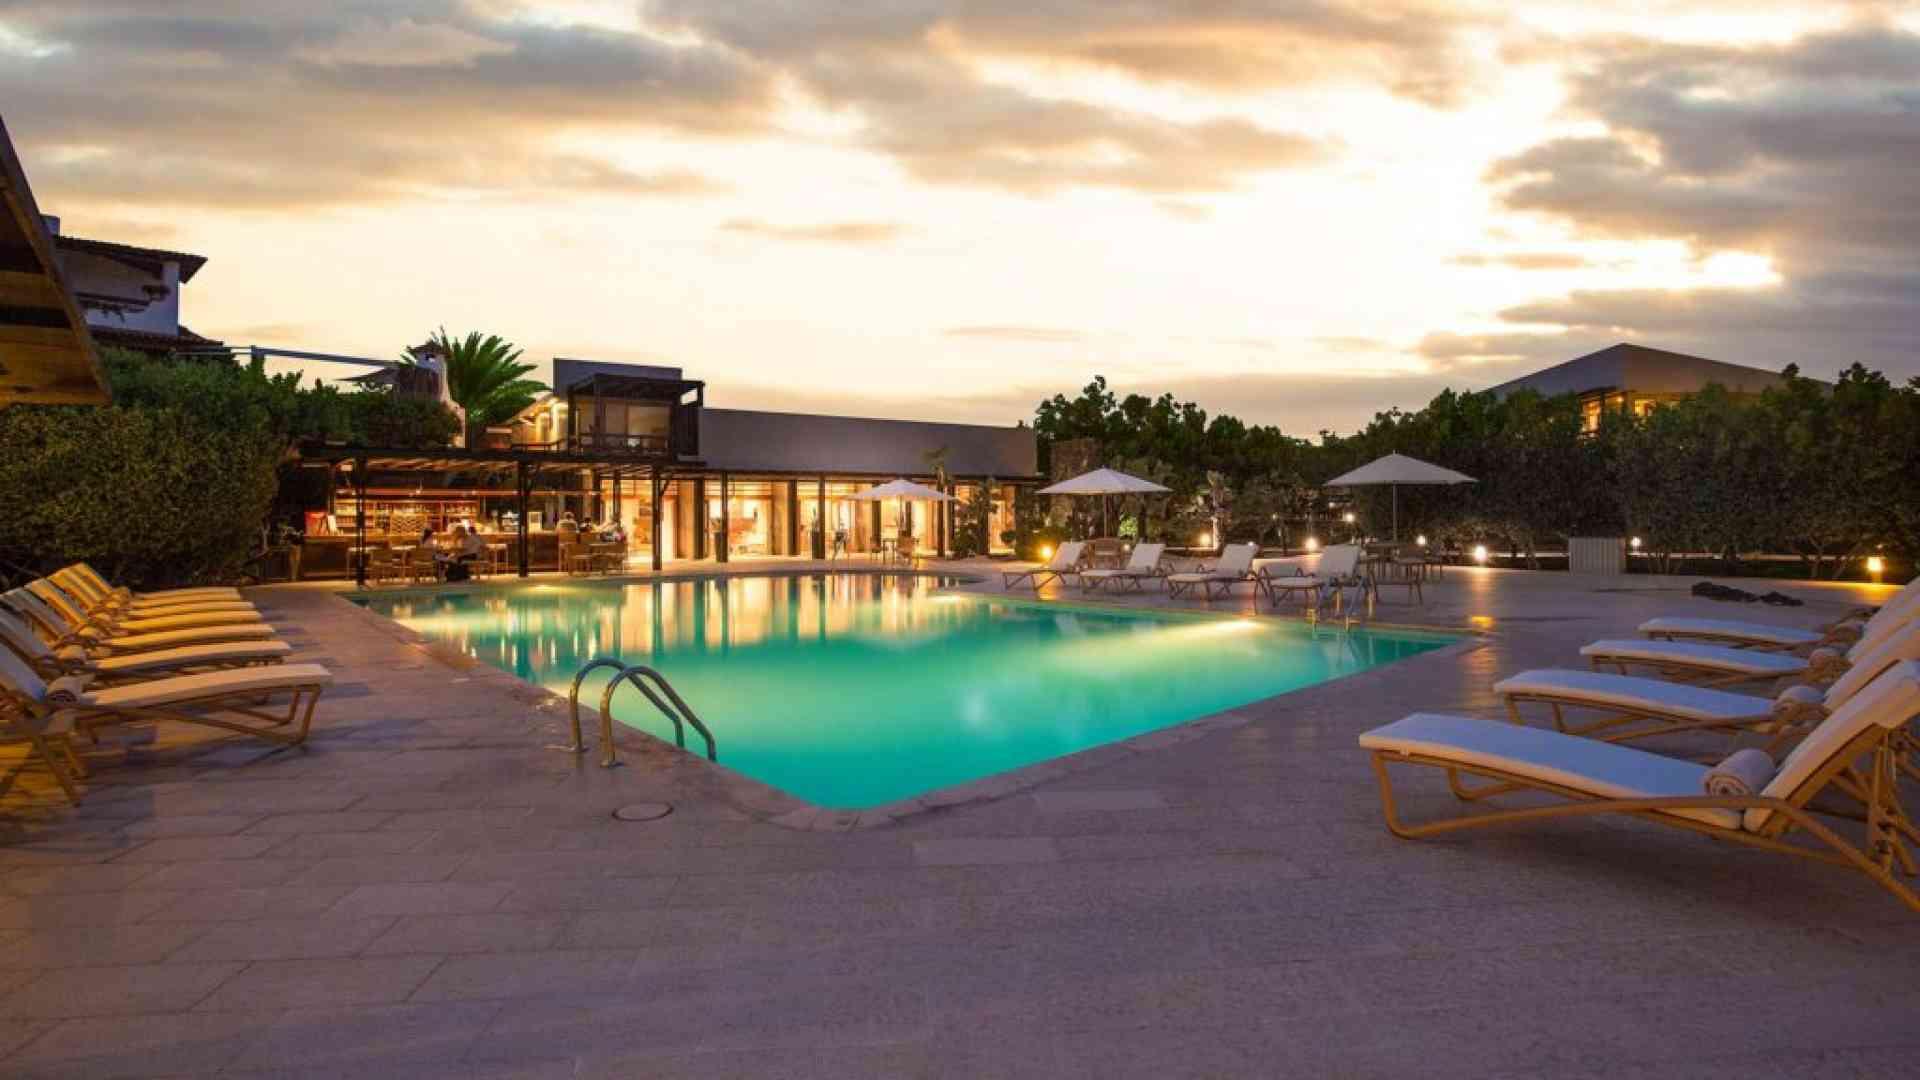 Finch Bay Eco Resort, Galapagos, Ecuador